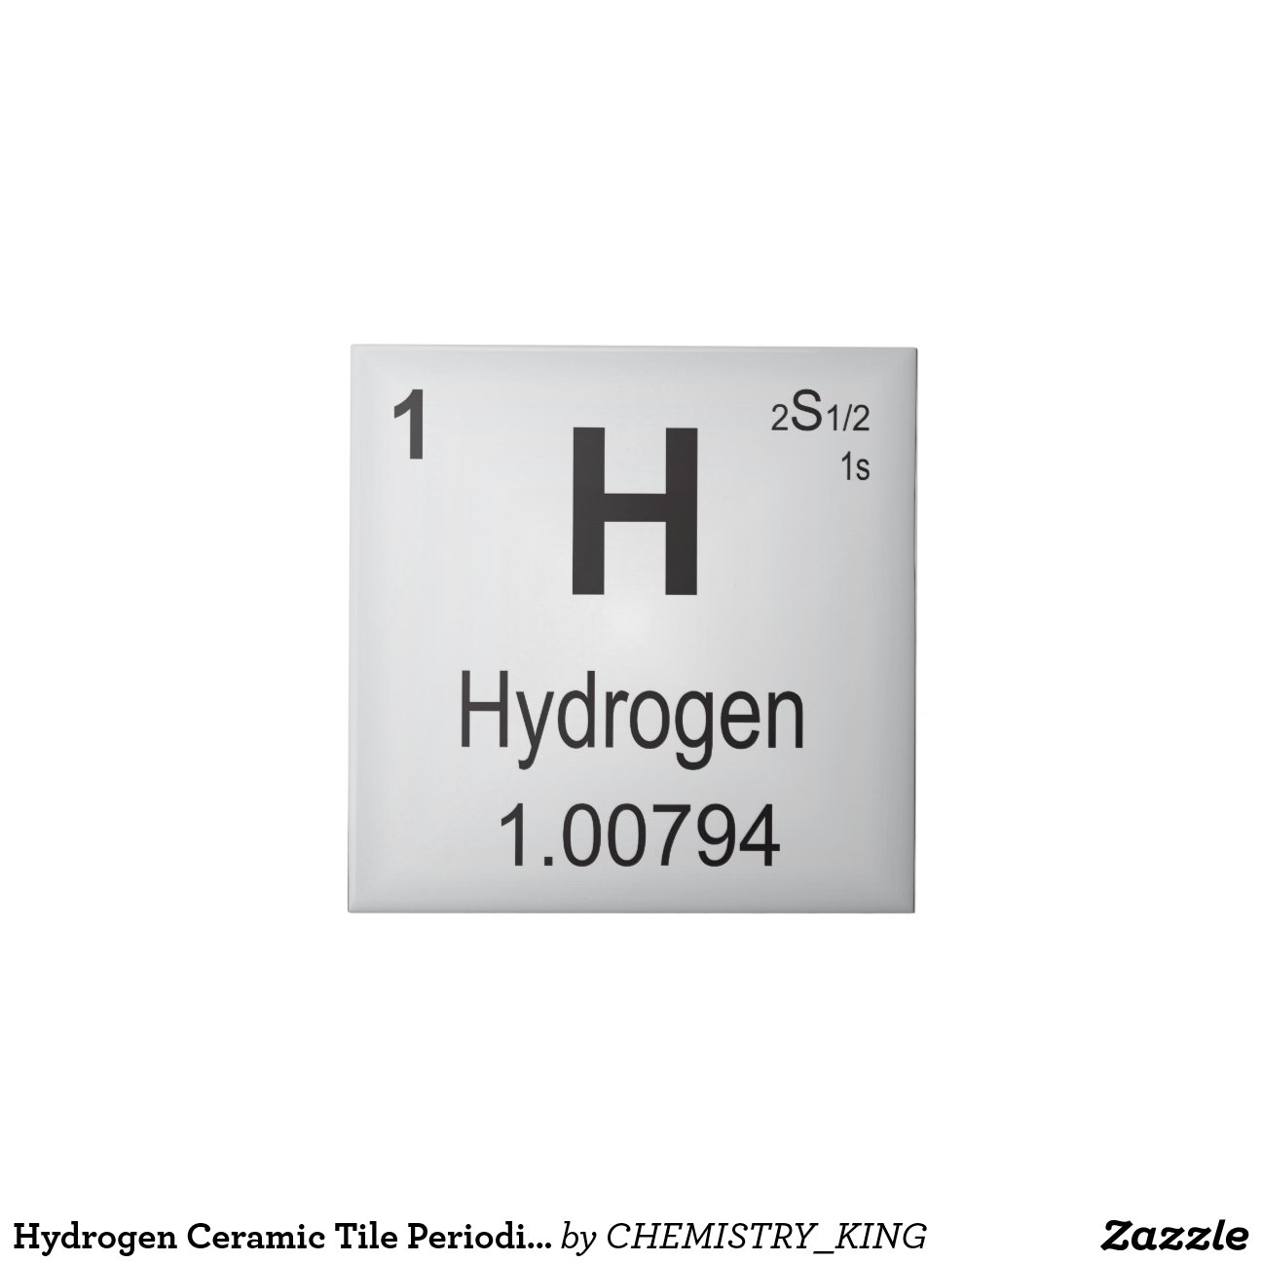 Hydrogen ceramic tile periodic table of elements zazzle - Hydrogen on the periodic table ...